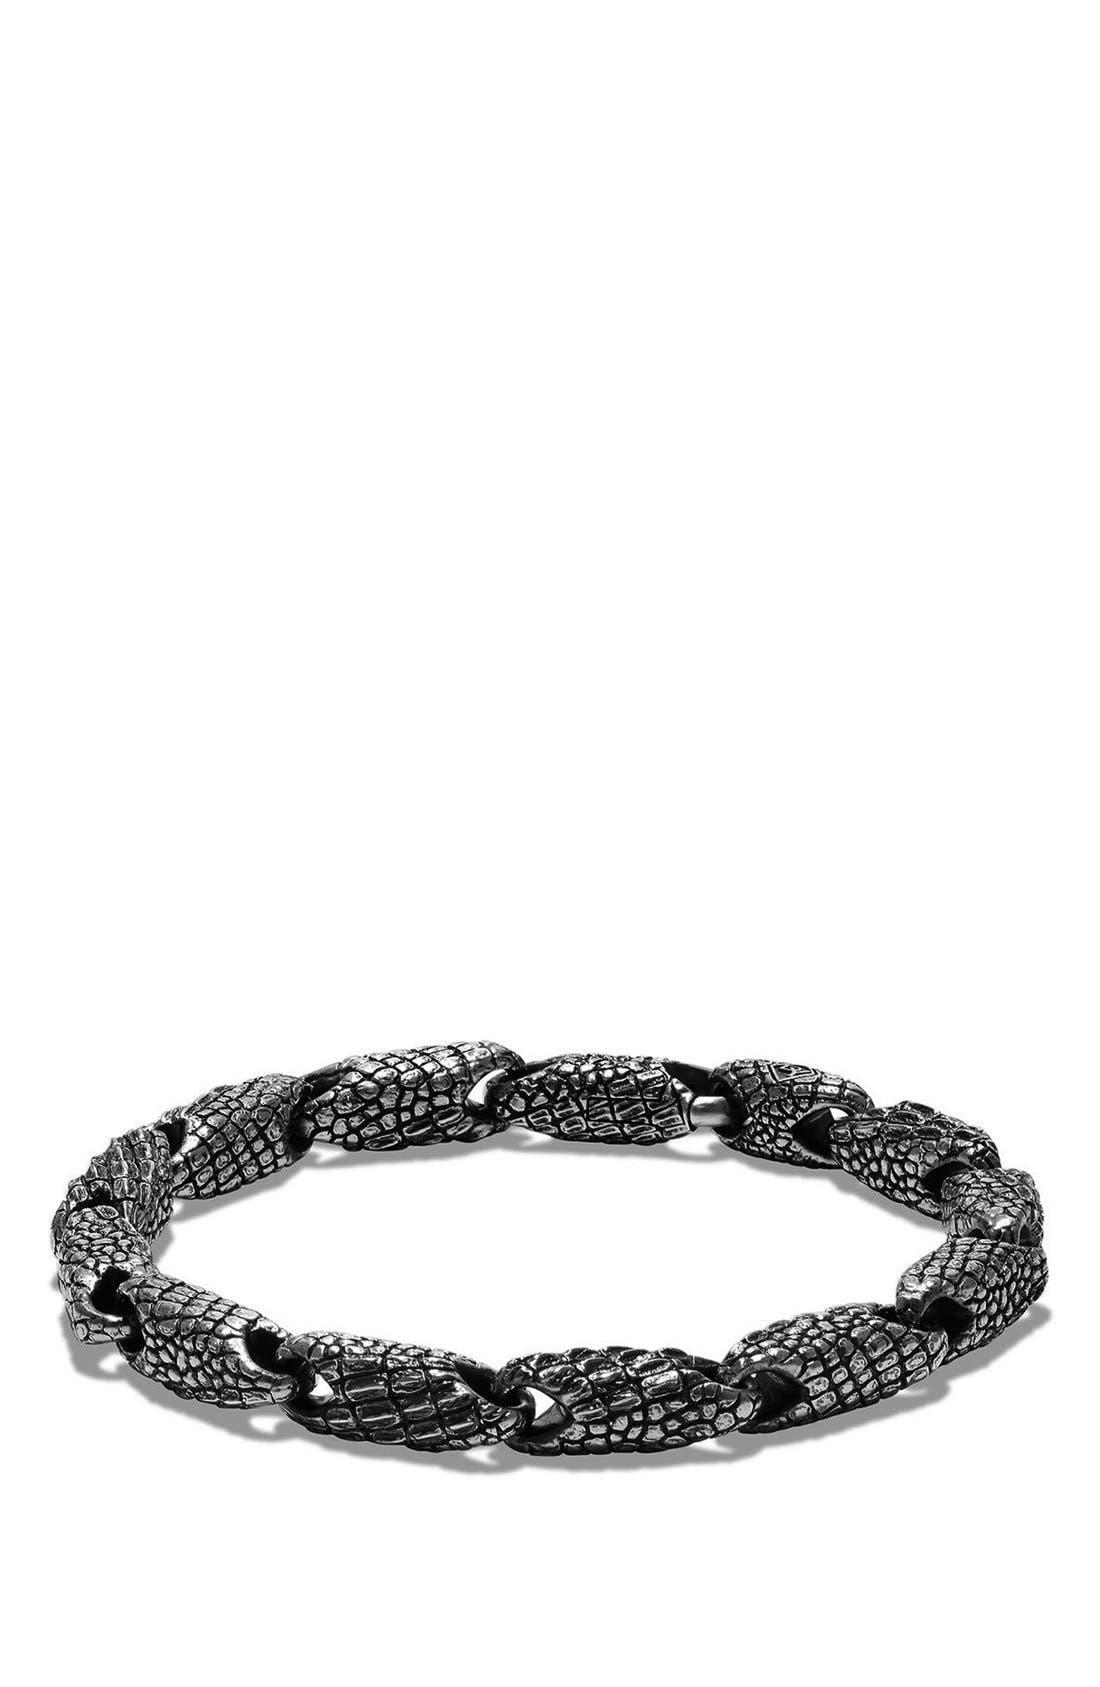 DAVID YURMAN Naturals Gator Link Bracelet